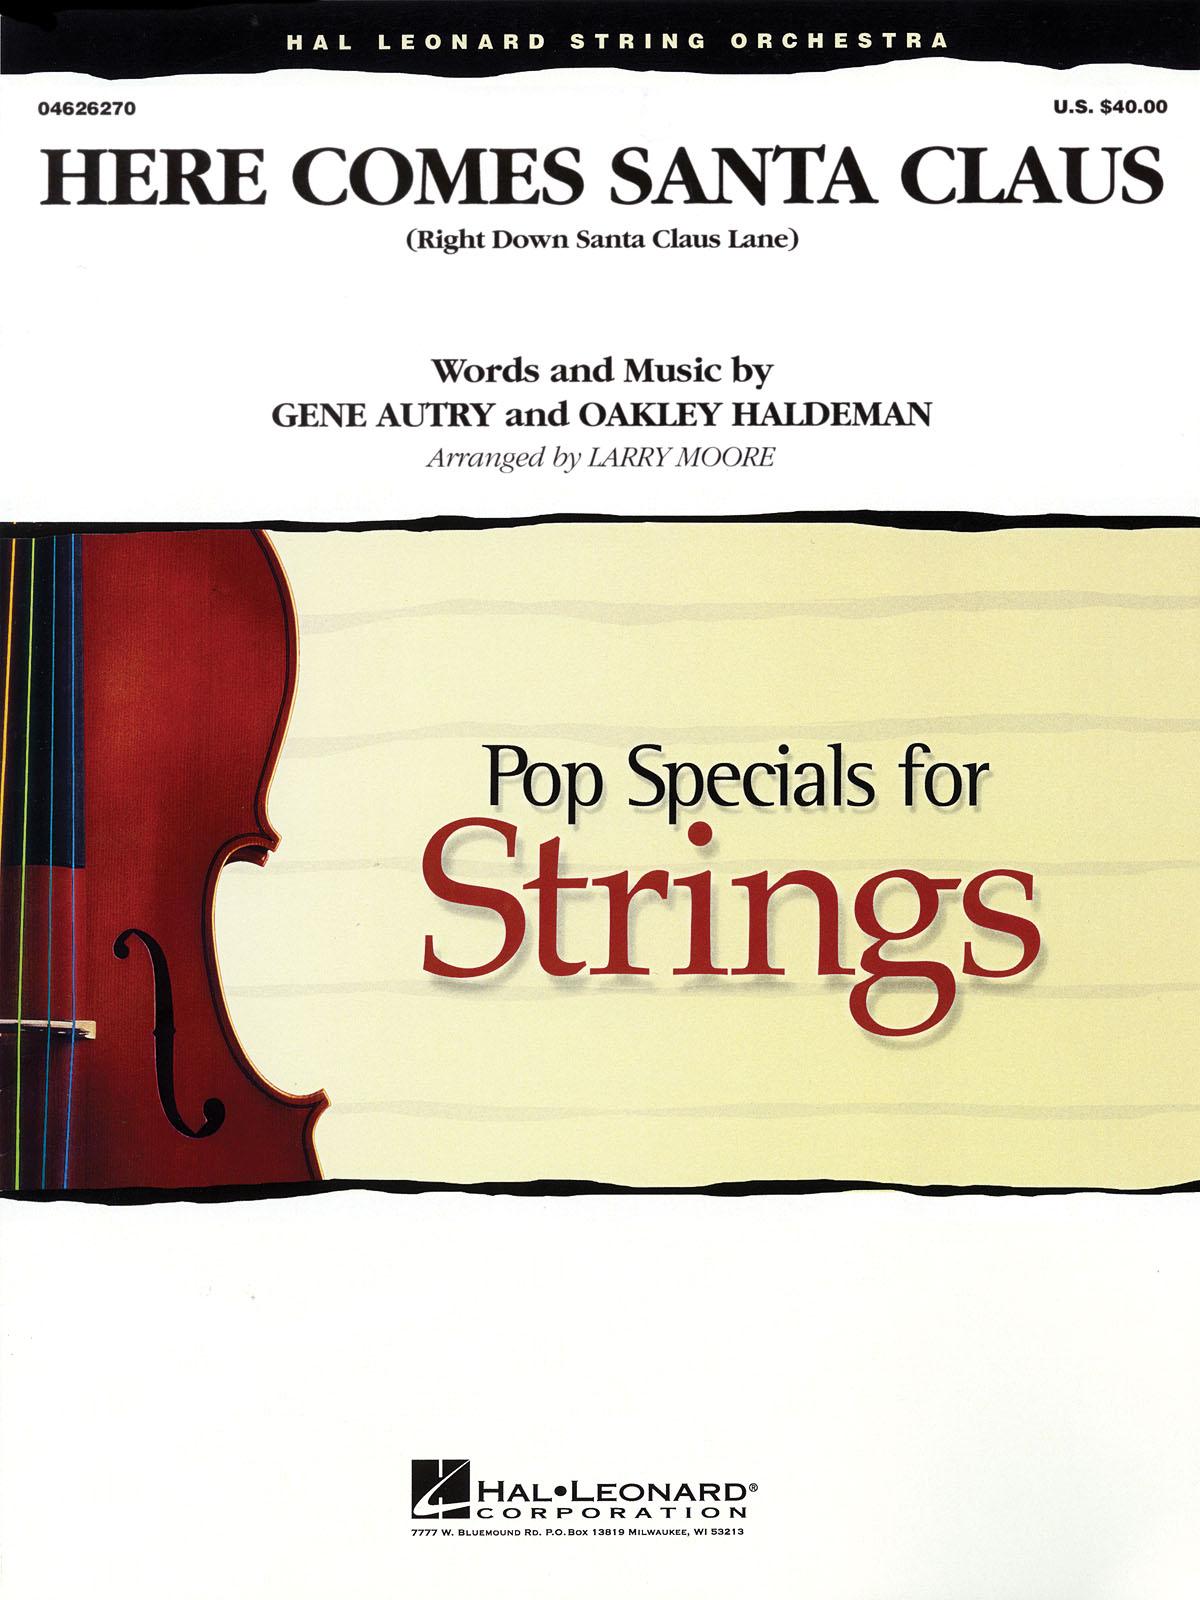 Gene Autry Oakley Haldeman: Here Comes Santa Claus: String Ensemble: Score &